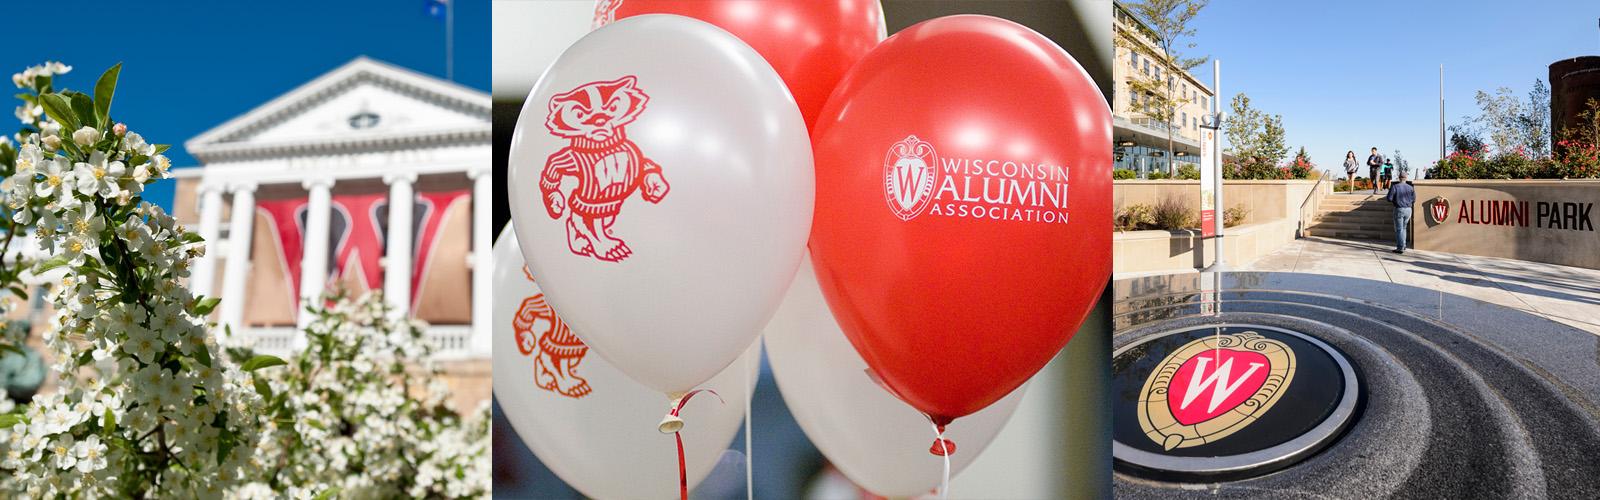 Bascom Hall, Alumni park and balloons featuring Bucky Badger and the Wisconsin Alumni Association logo